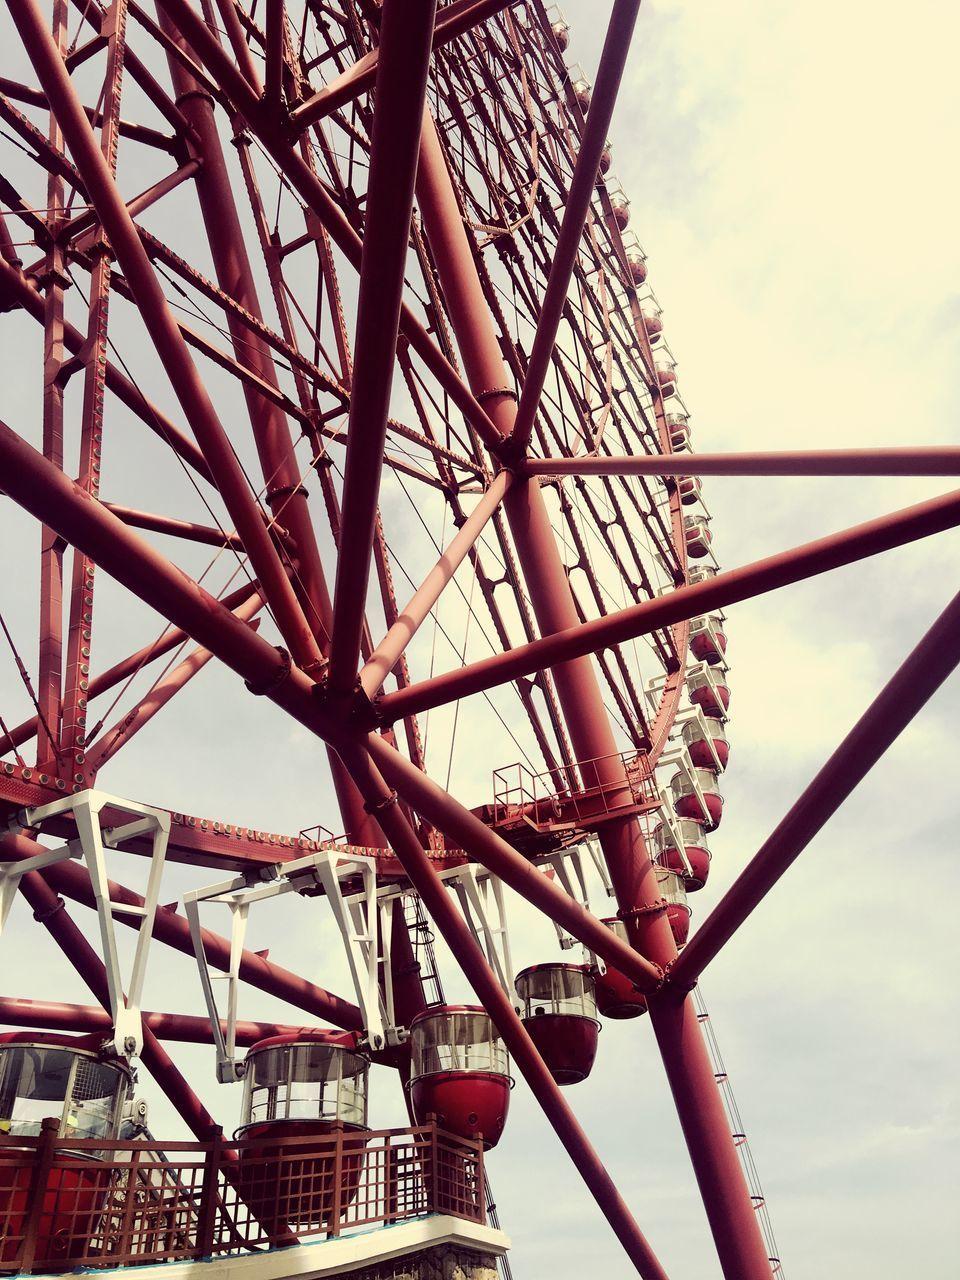 sky, low angle view, amusement park, amusement park ride, arts culture and entertainment, metal, ferris wheel, day, built structure, nature, architecture, no people, cloud - sky, fairground, outdoors, leisure activity, large, tall - high, grid, tourism, steel